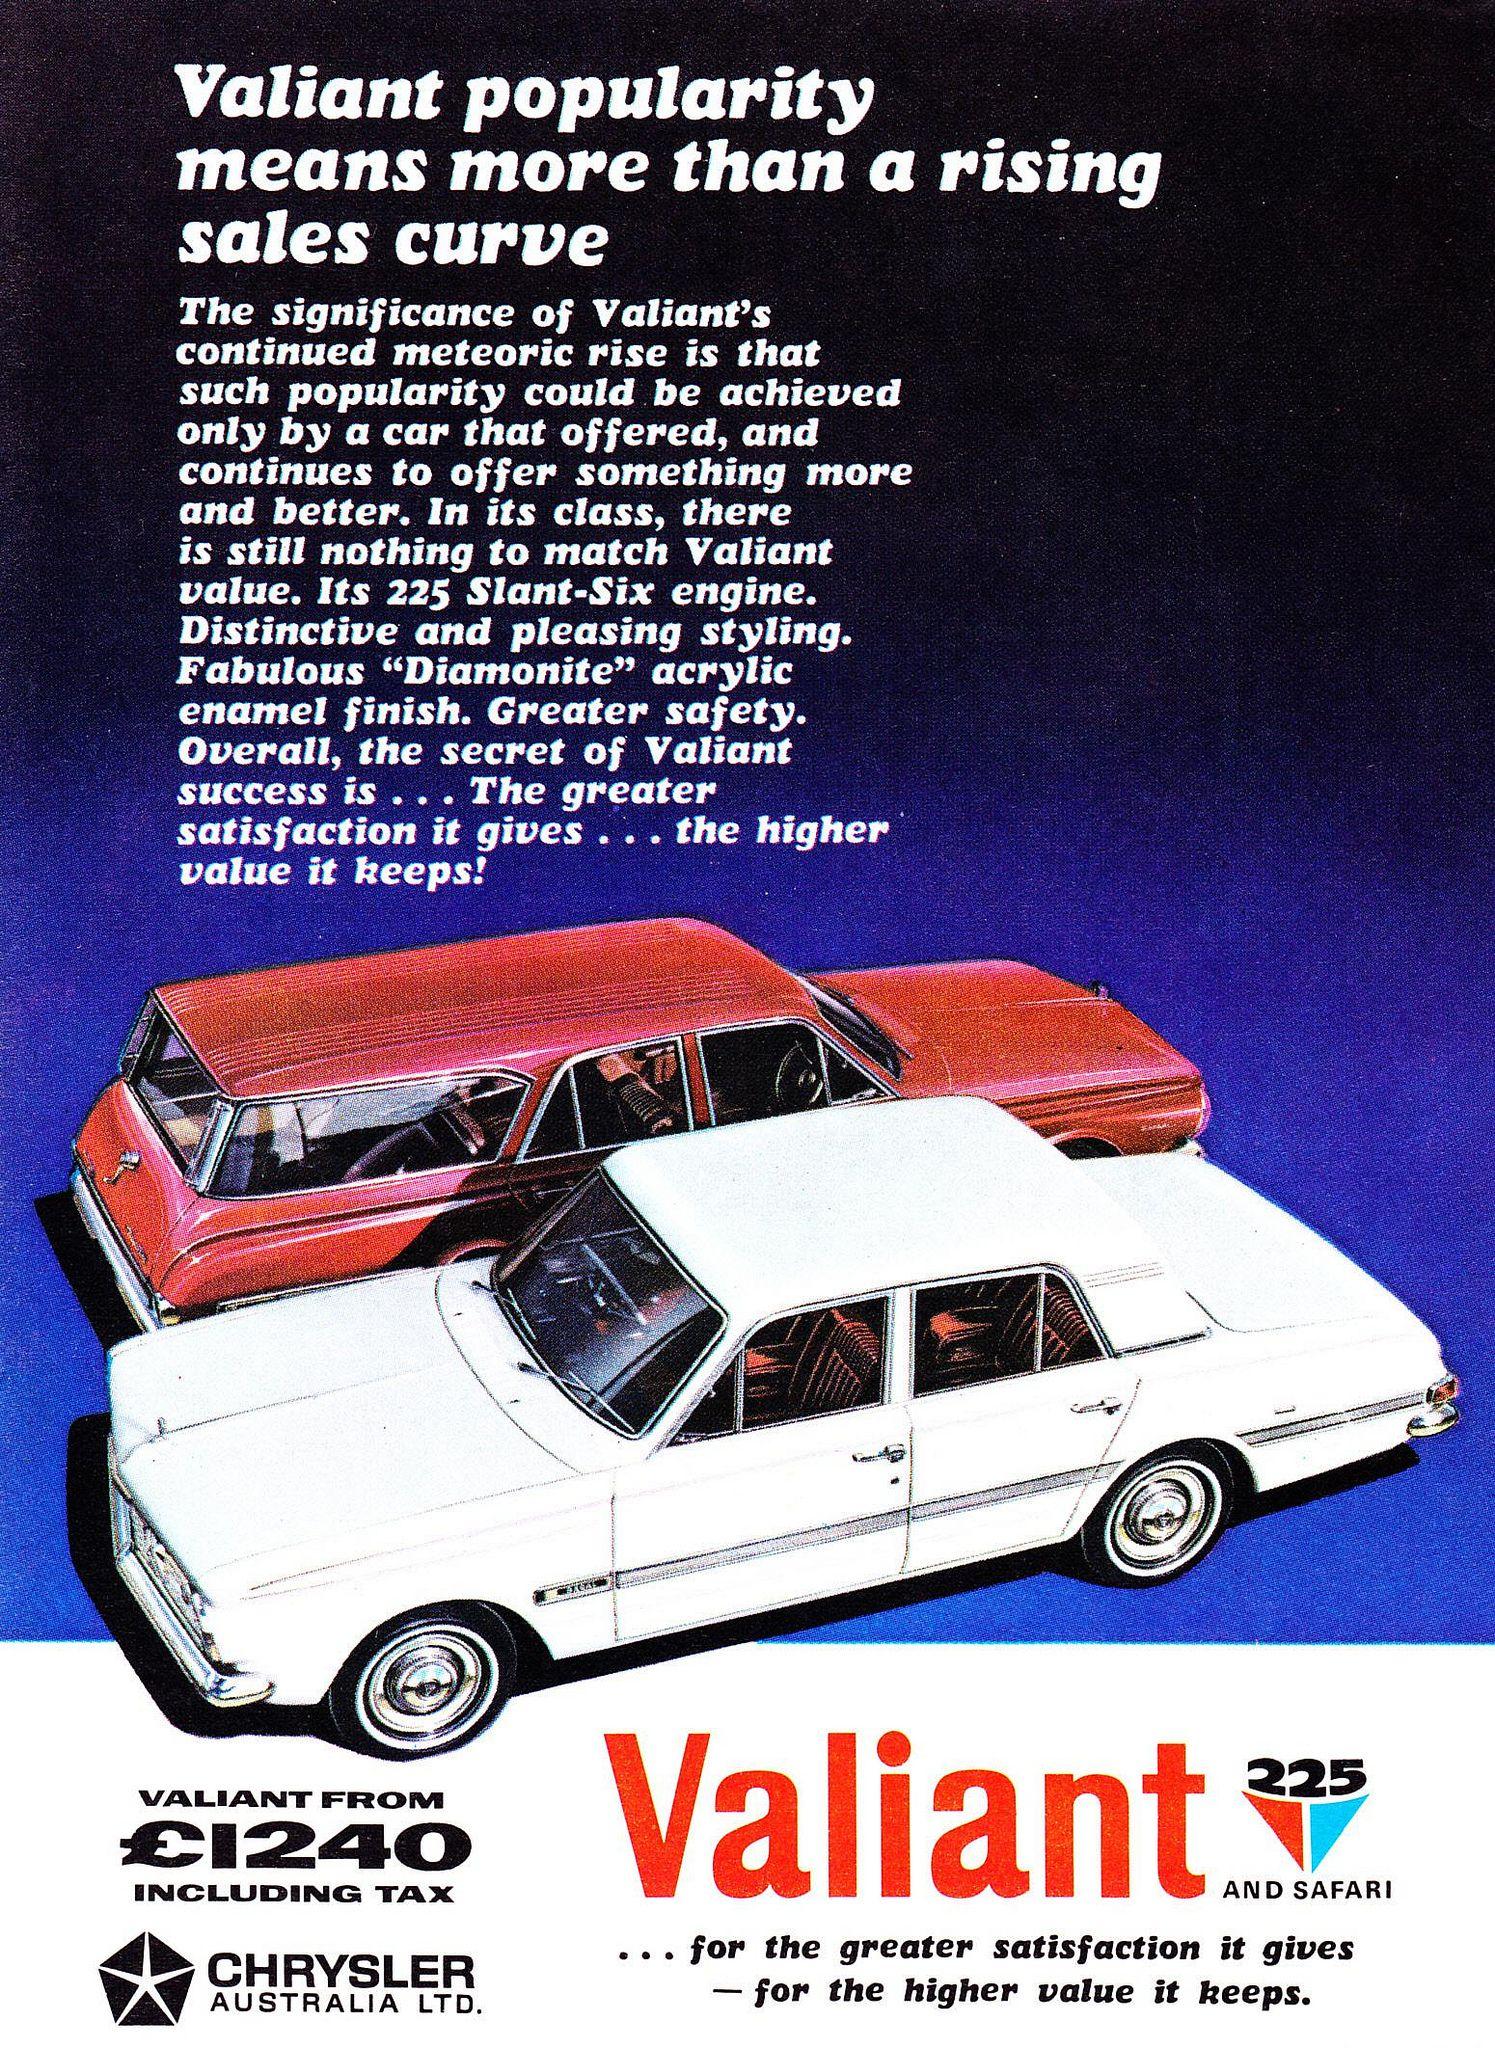 Pin by Justin Ellis on Vintage Auto Ads | Pinterest | Cars, Mopar ...